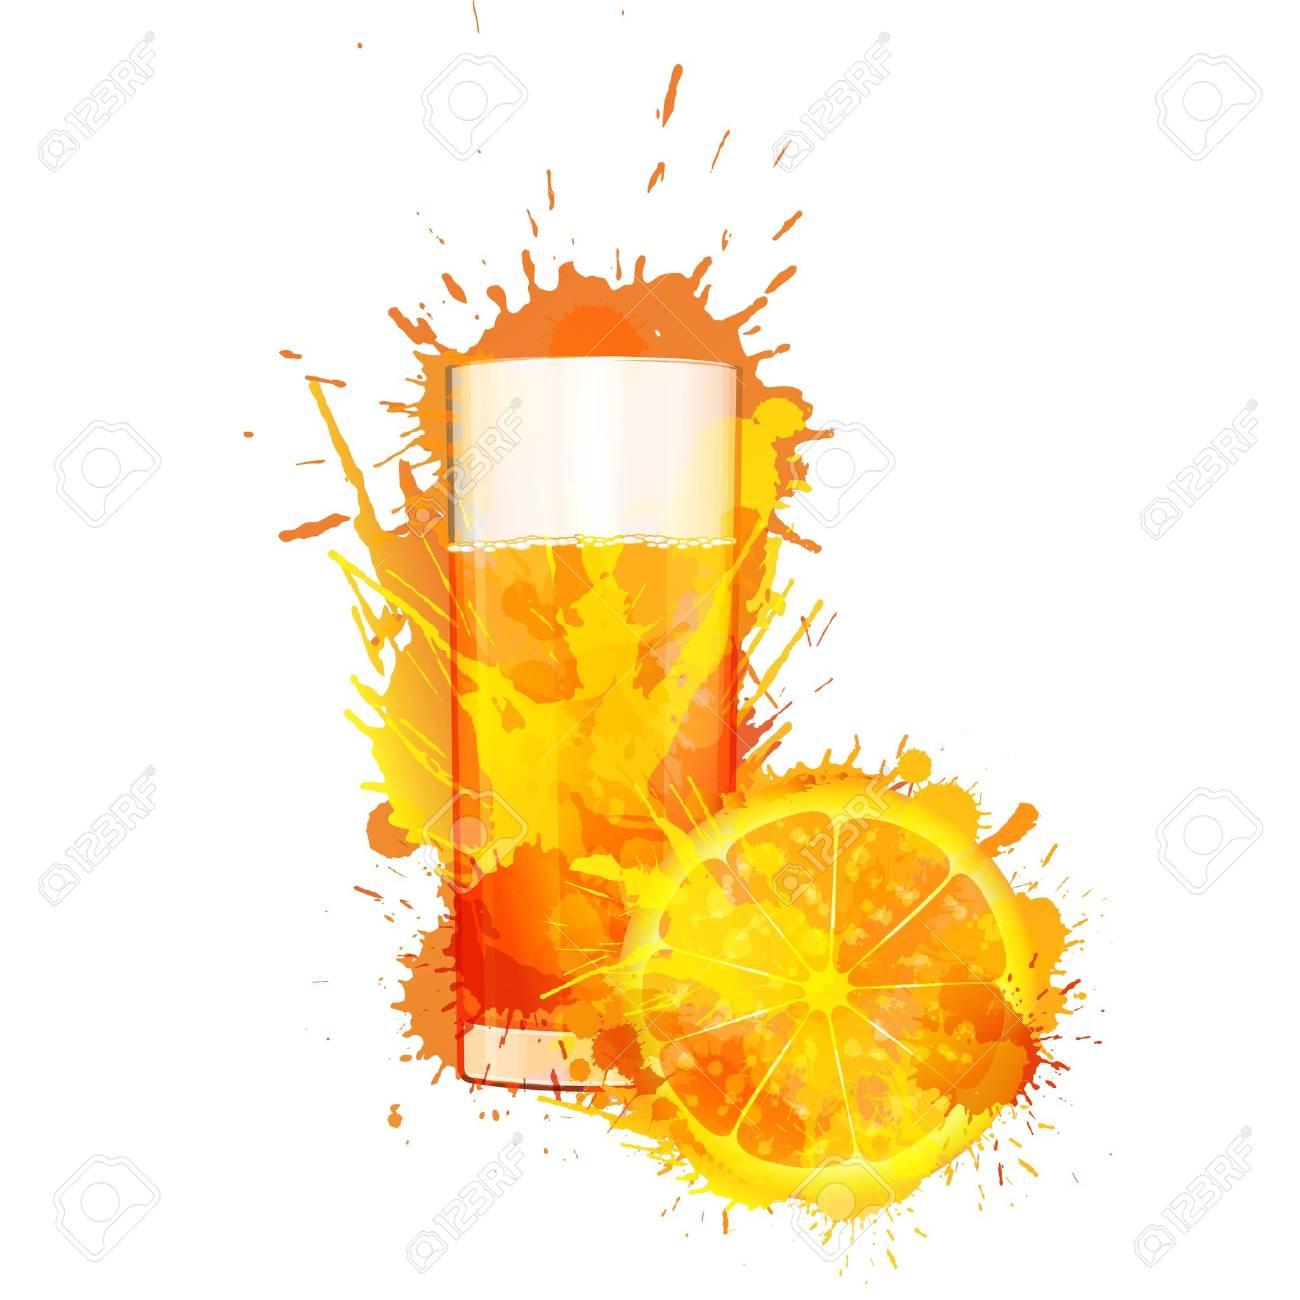 Orange slice and glass of orange juice made of colorful splashes on white background Stock Vector - 21563501